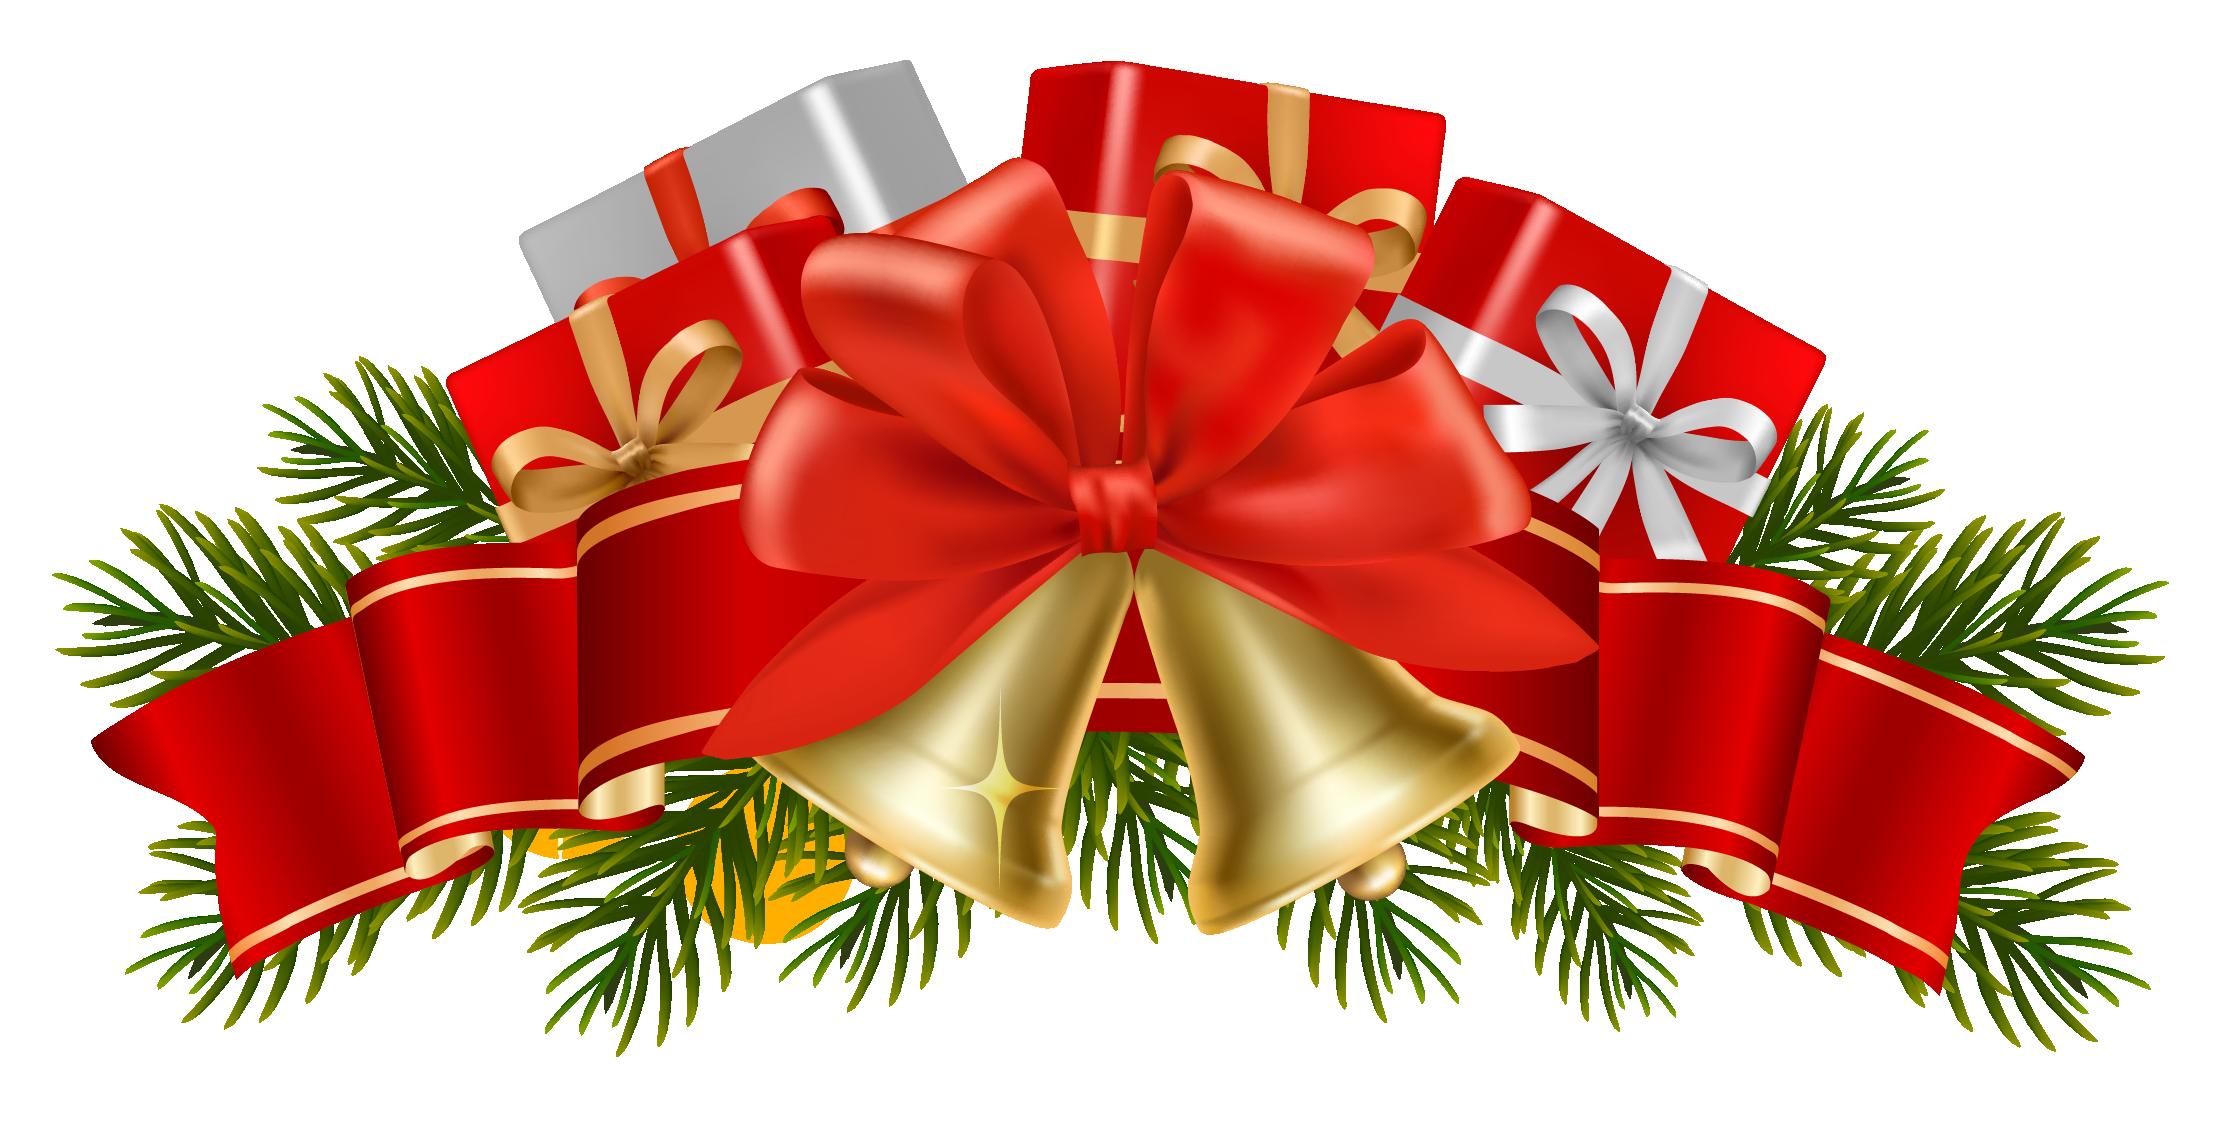 Christmas Clip Art Banners .-Christmas Clip Art Banners .-5